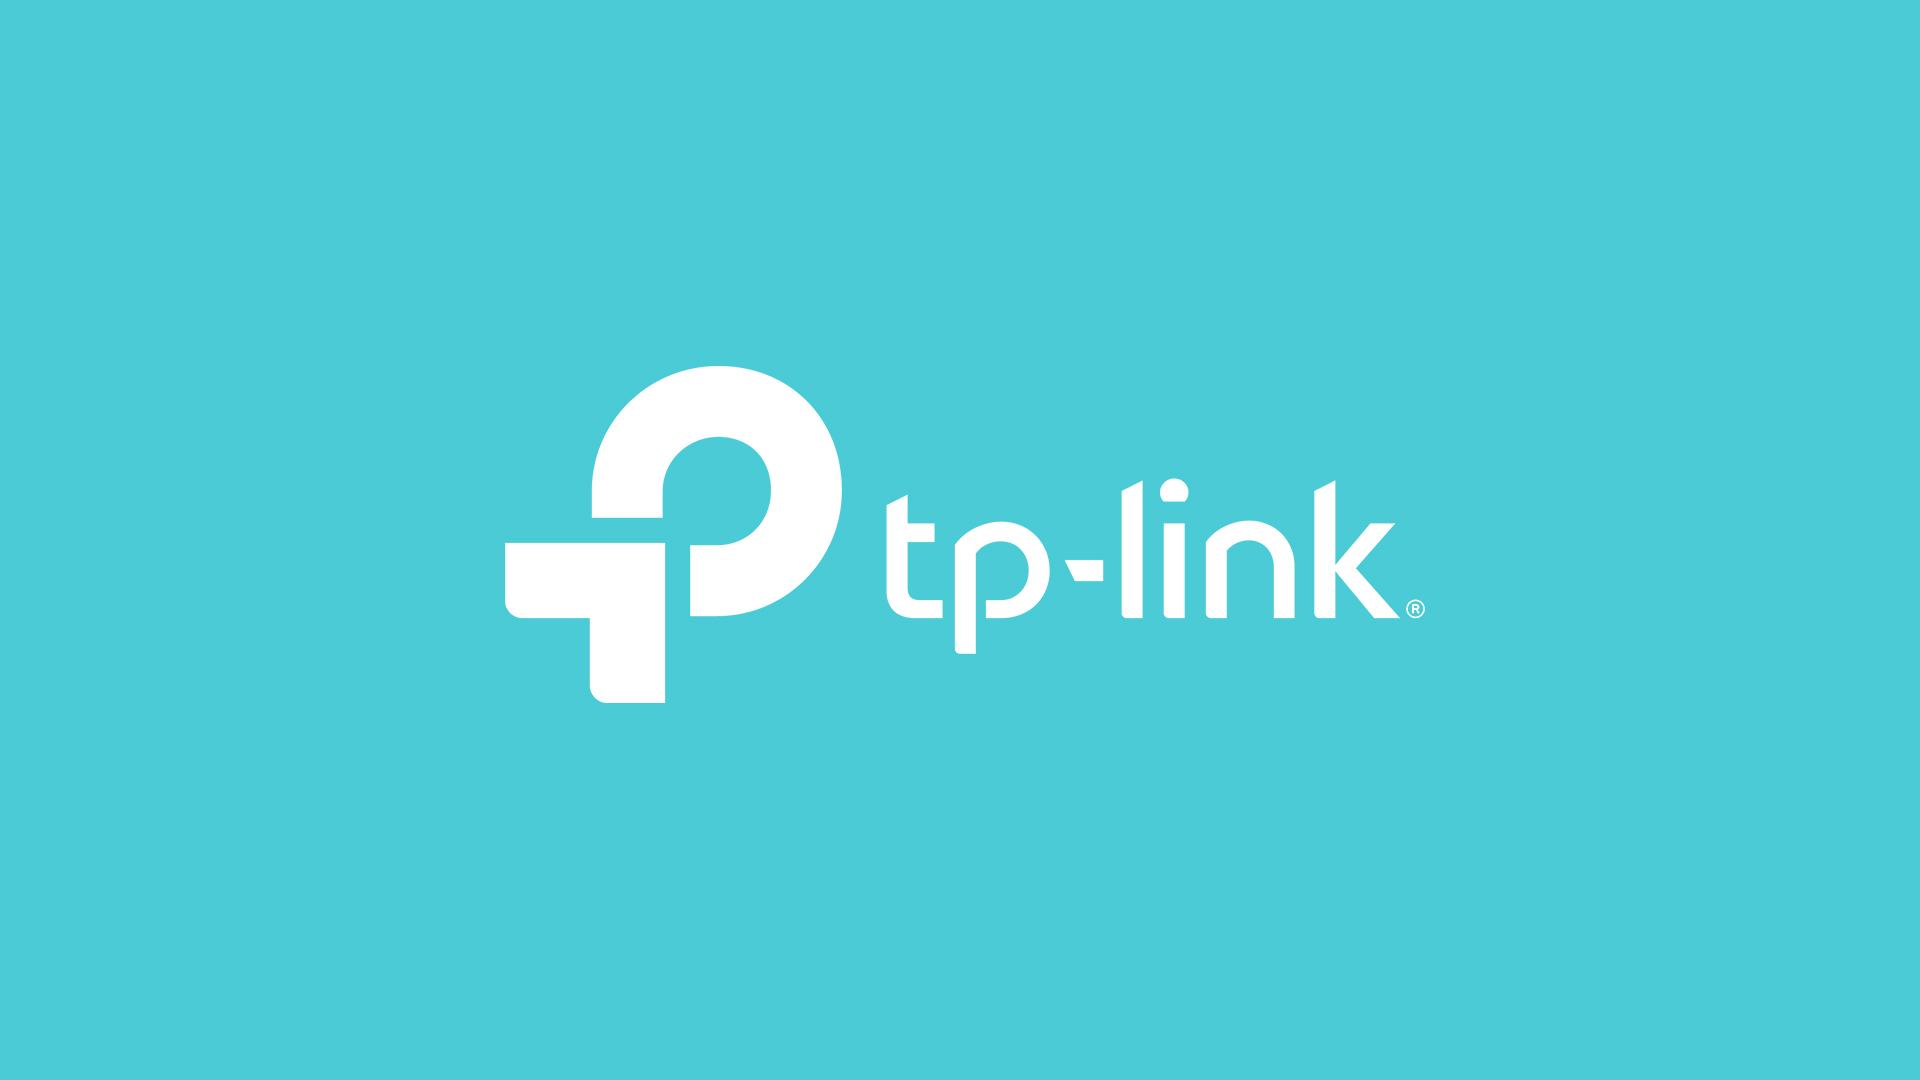 فریمور مودم TP-LINK TD-W8961ND Ver3